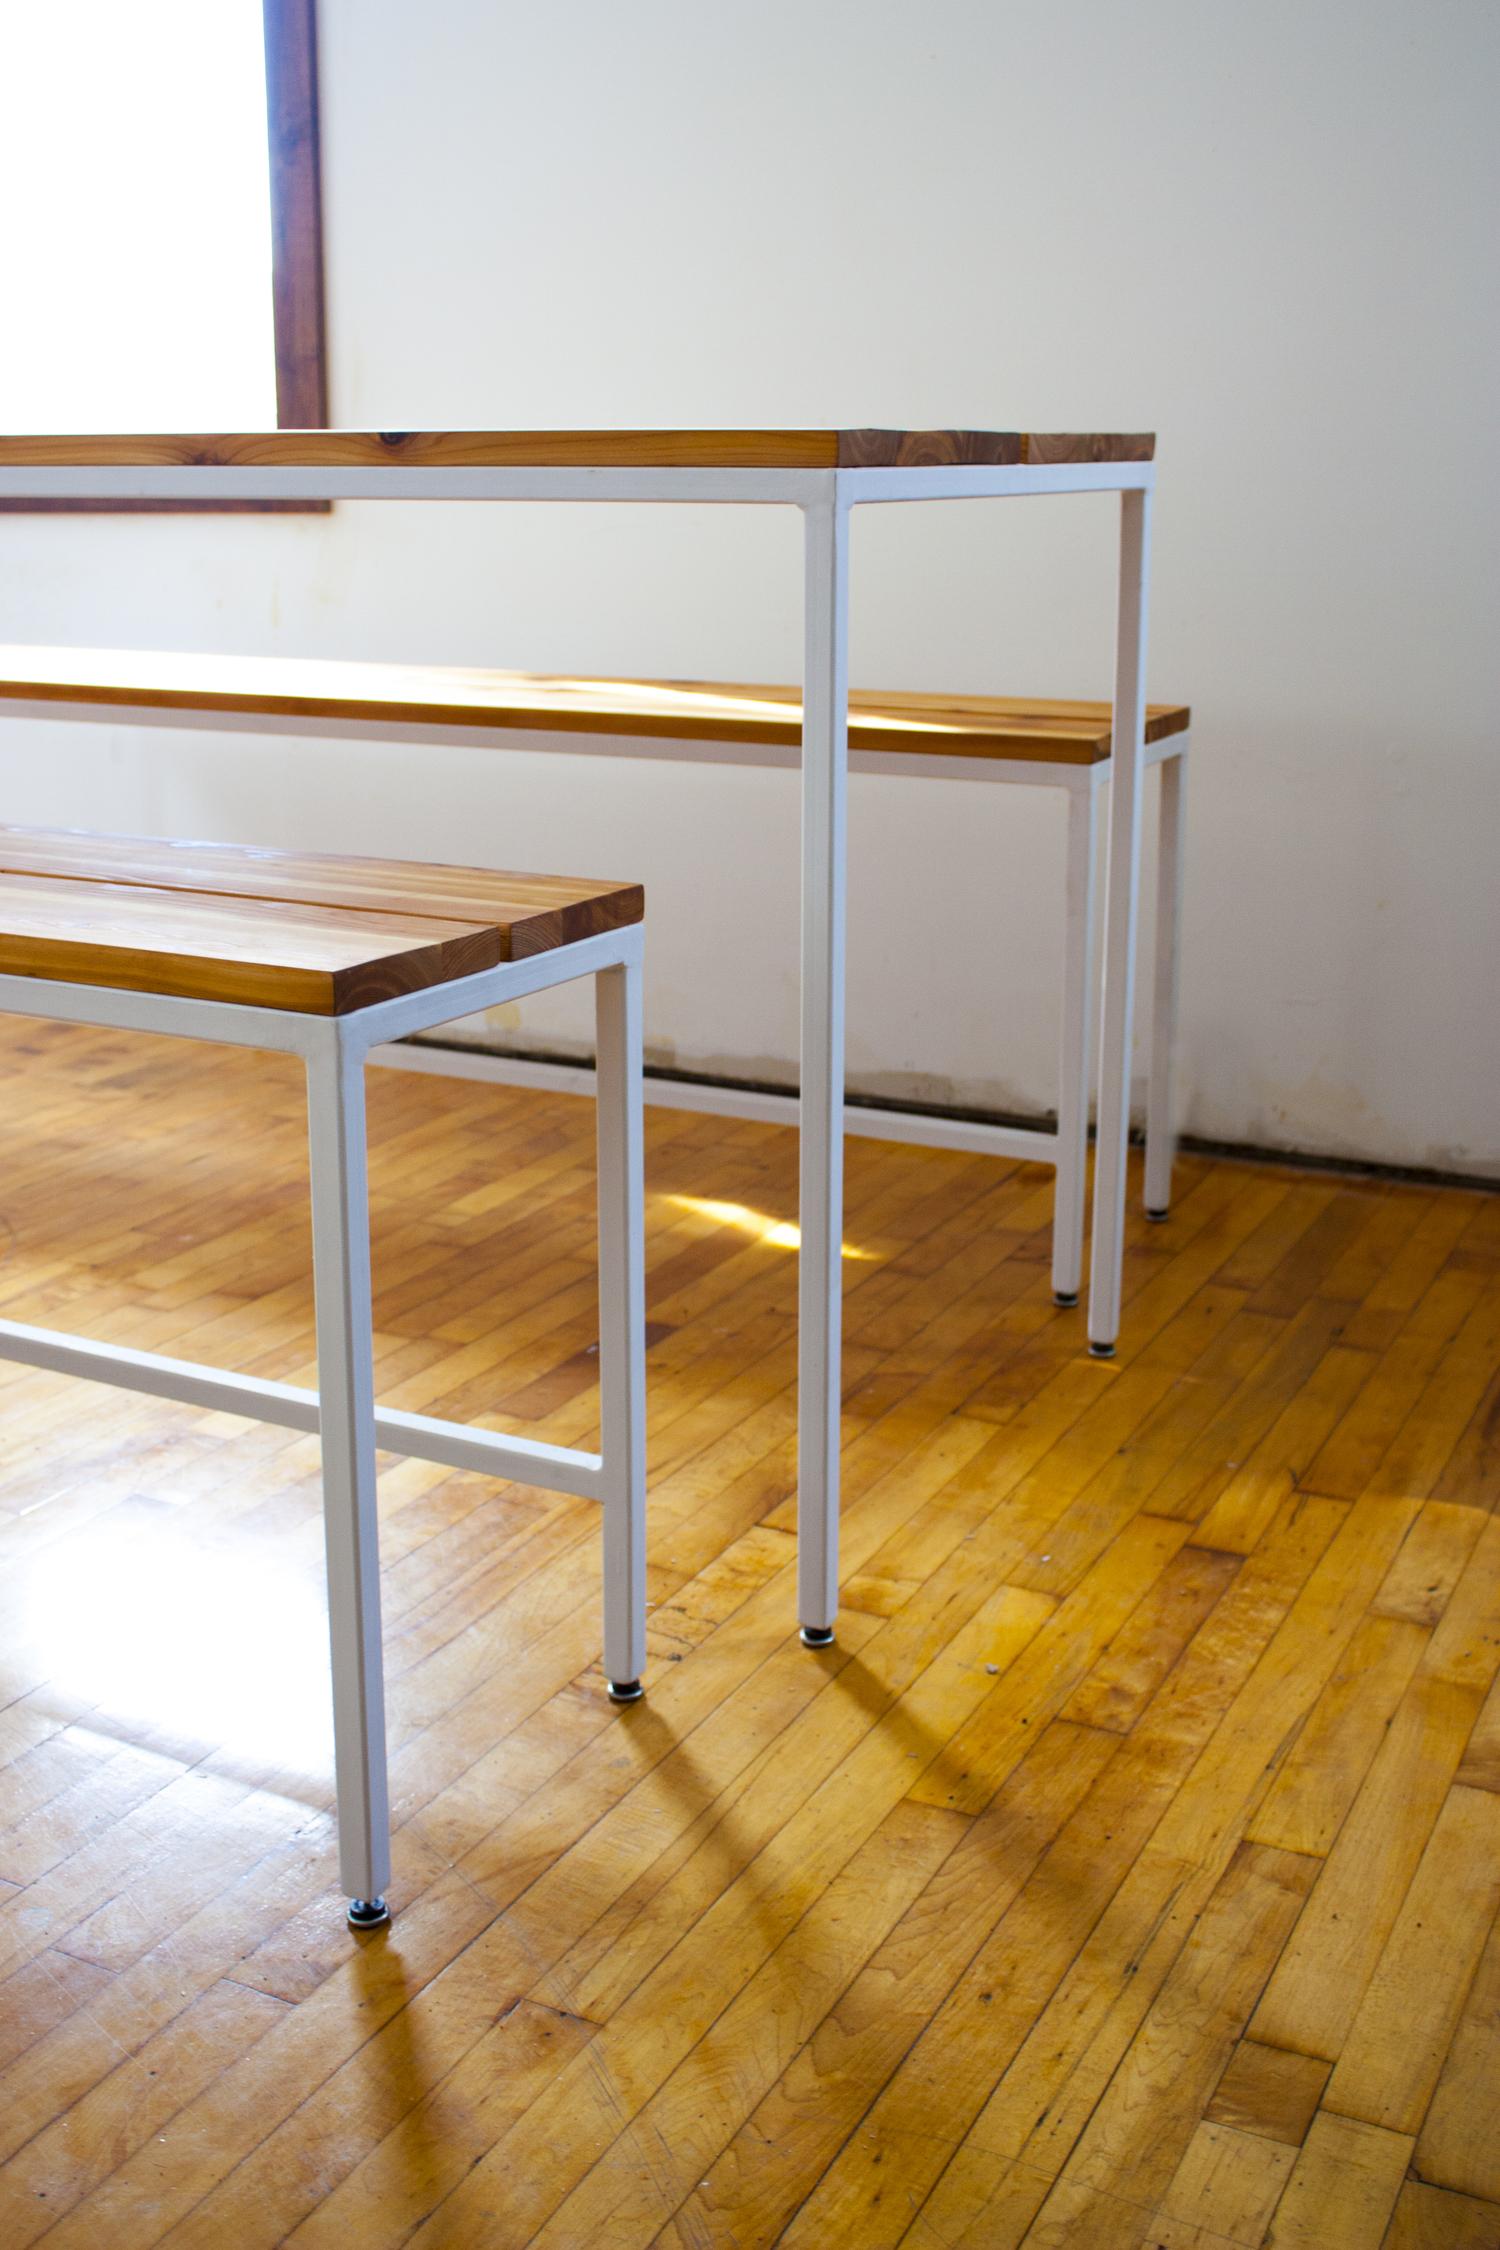 Studio Cidra: Atsuko Nesting Table